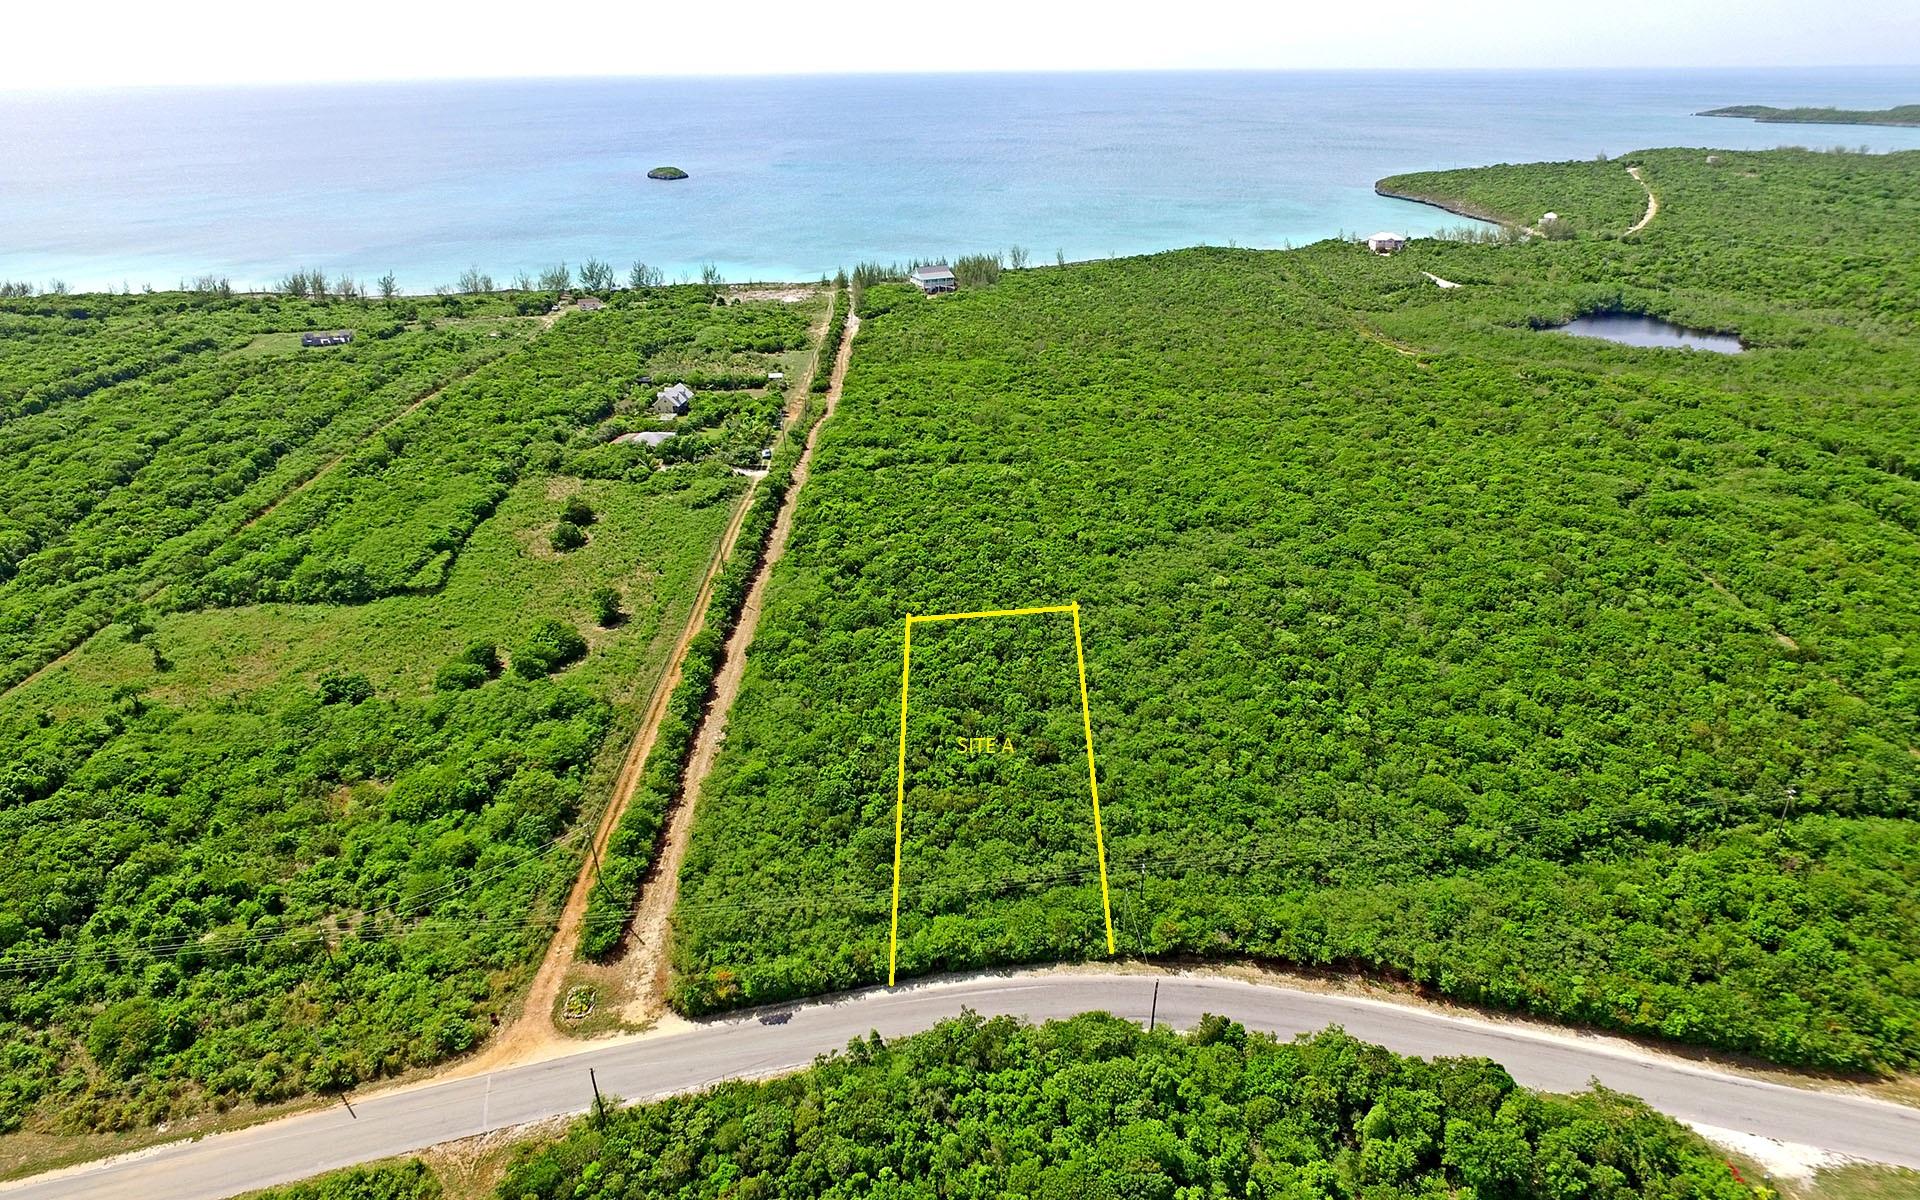 Land for Sale at Moonlight Bay Highway Lots, Savannah Sound, Eleuthera / MLS 28623 Savannah Sound, Eleuthera, Bahamas